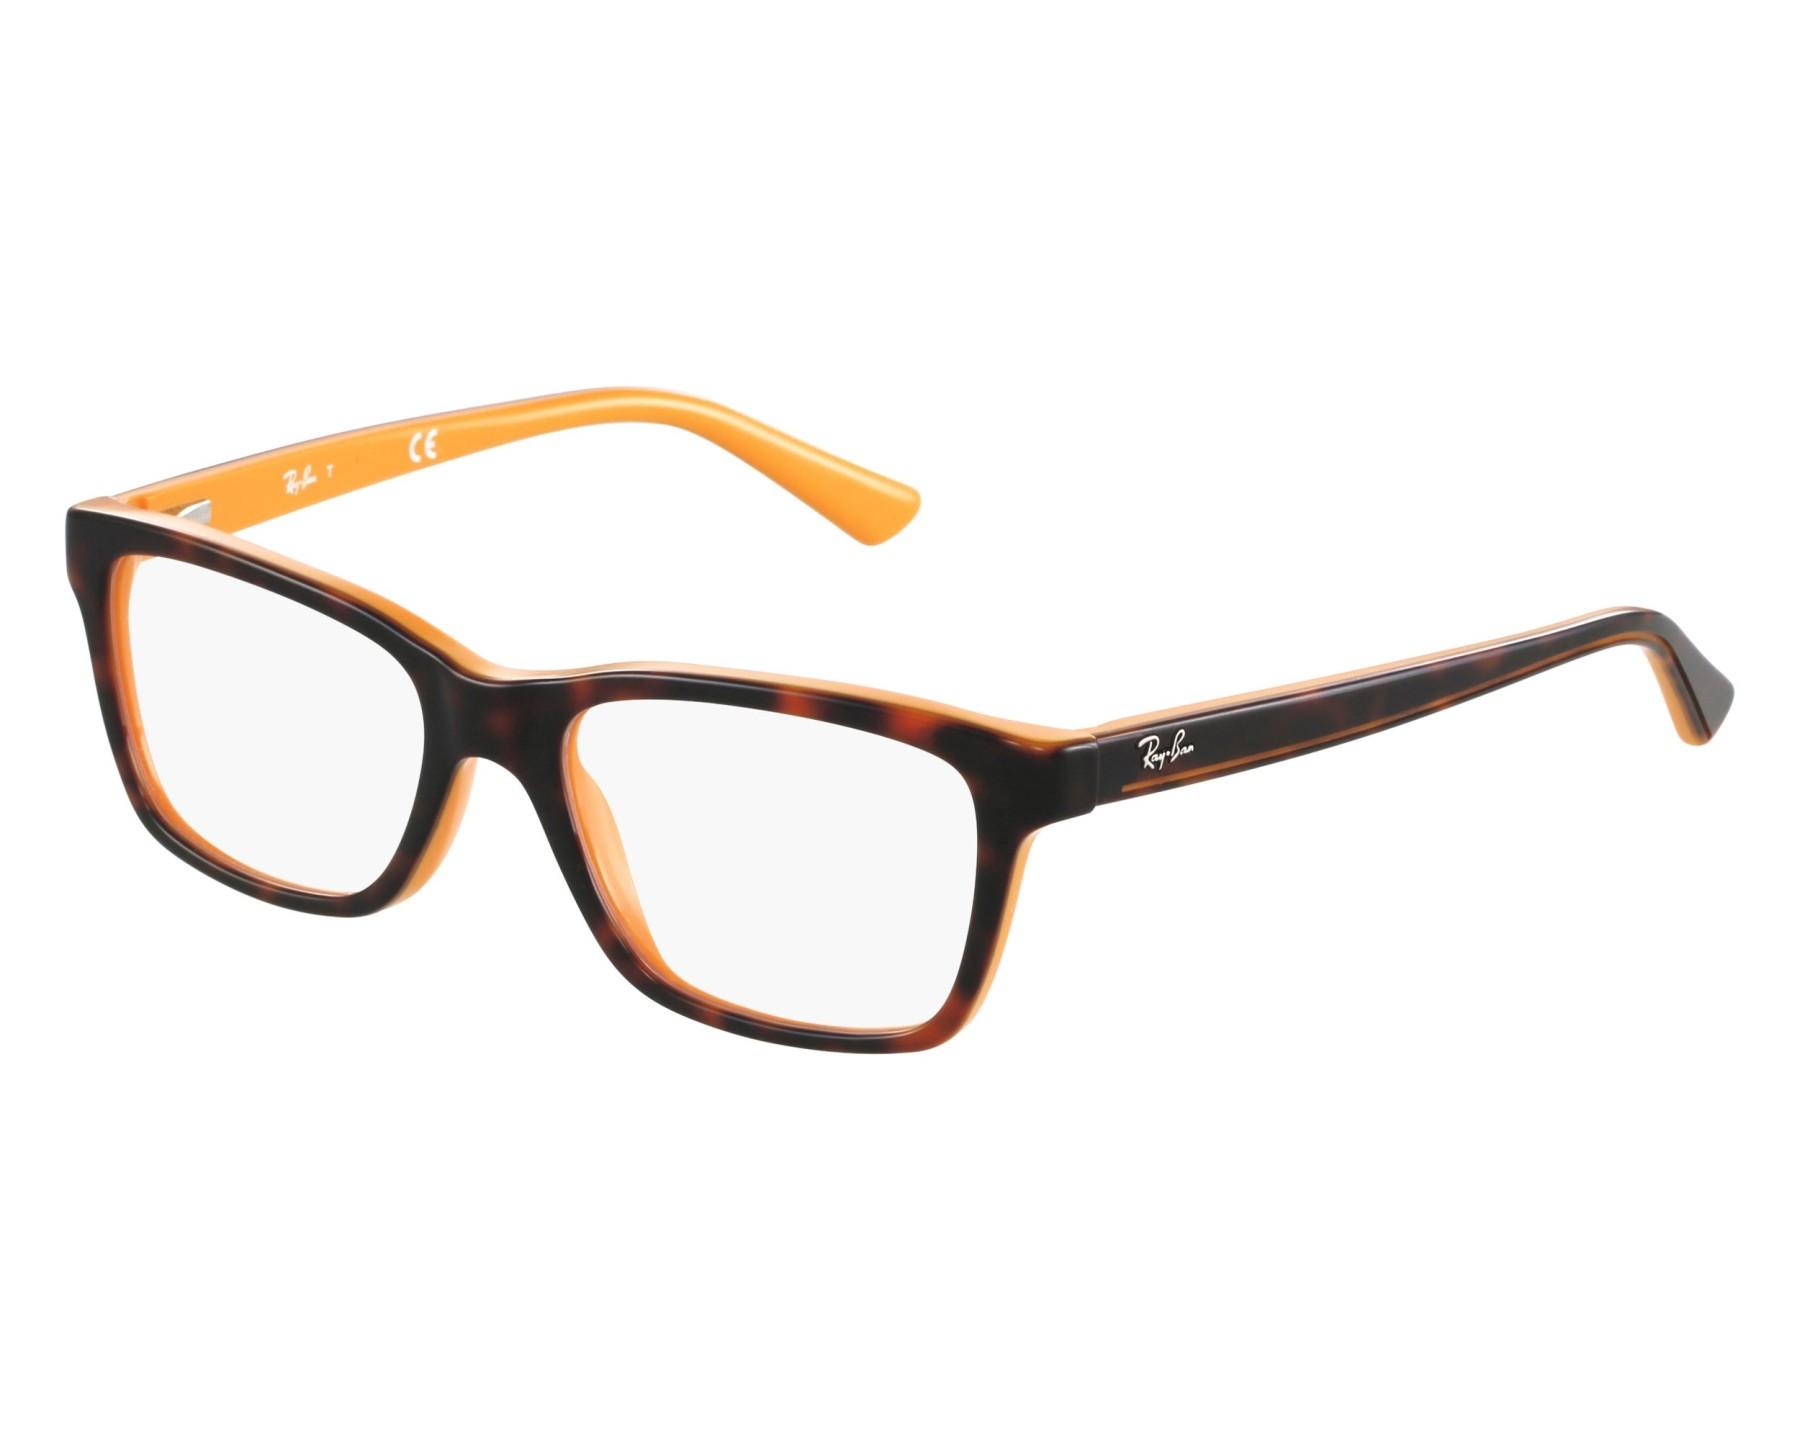 9aceee1289 Ray Ban Eyeglasses RY-1536 3661 Havana - VISIONET USA Ray-Ban RY 1536 3529  Black-Transparent Junior